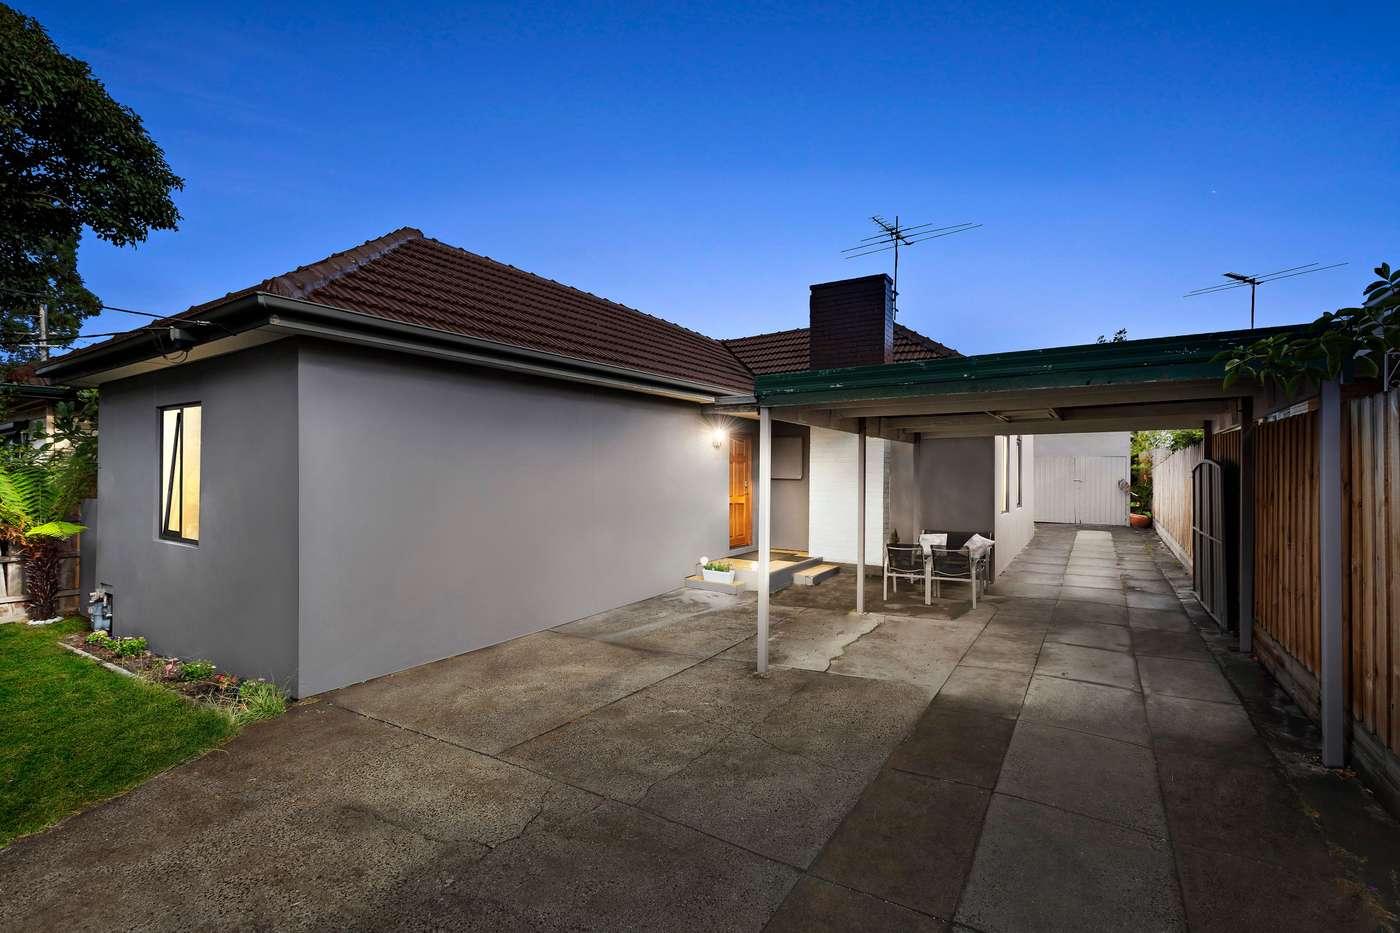 Main view of Homely house listing, 1638 Dandenong Road, Huntingdale, VIC 3166